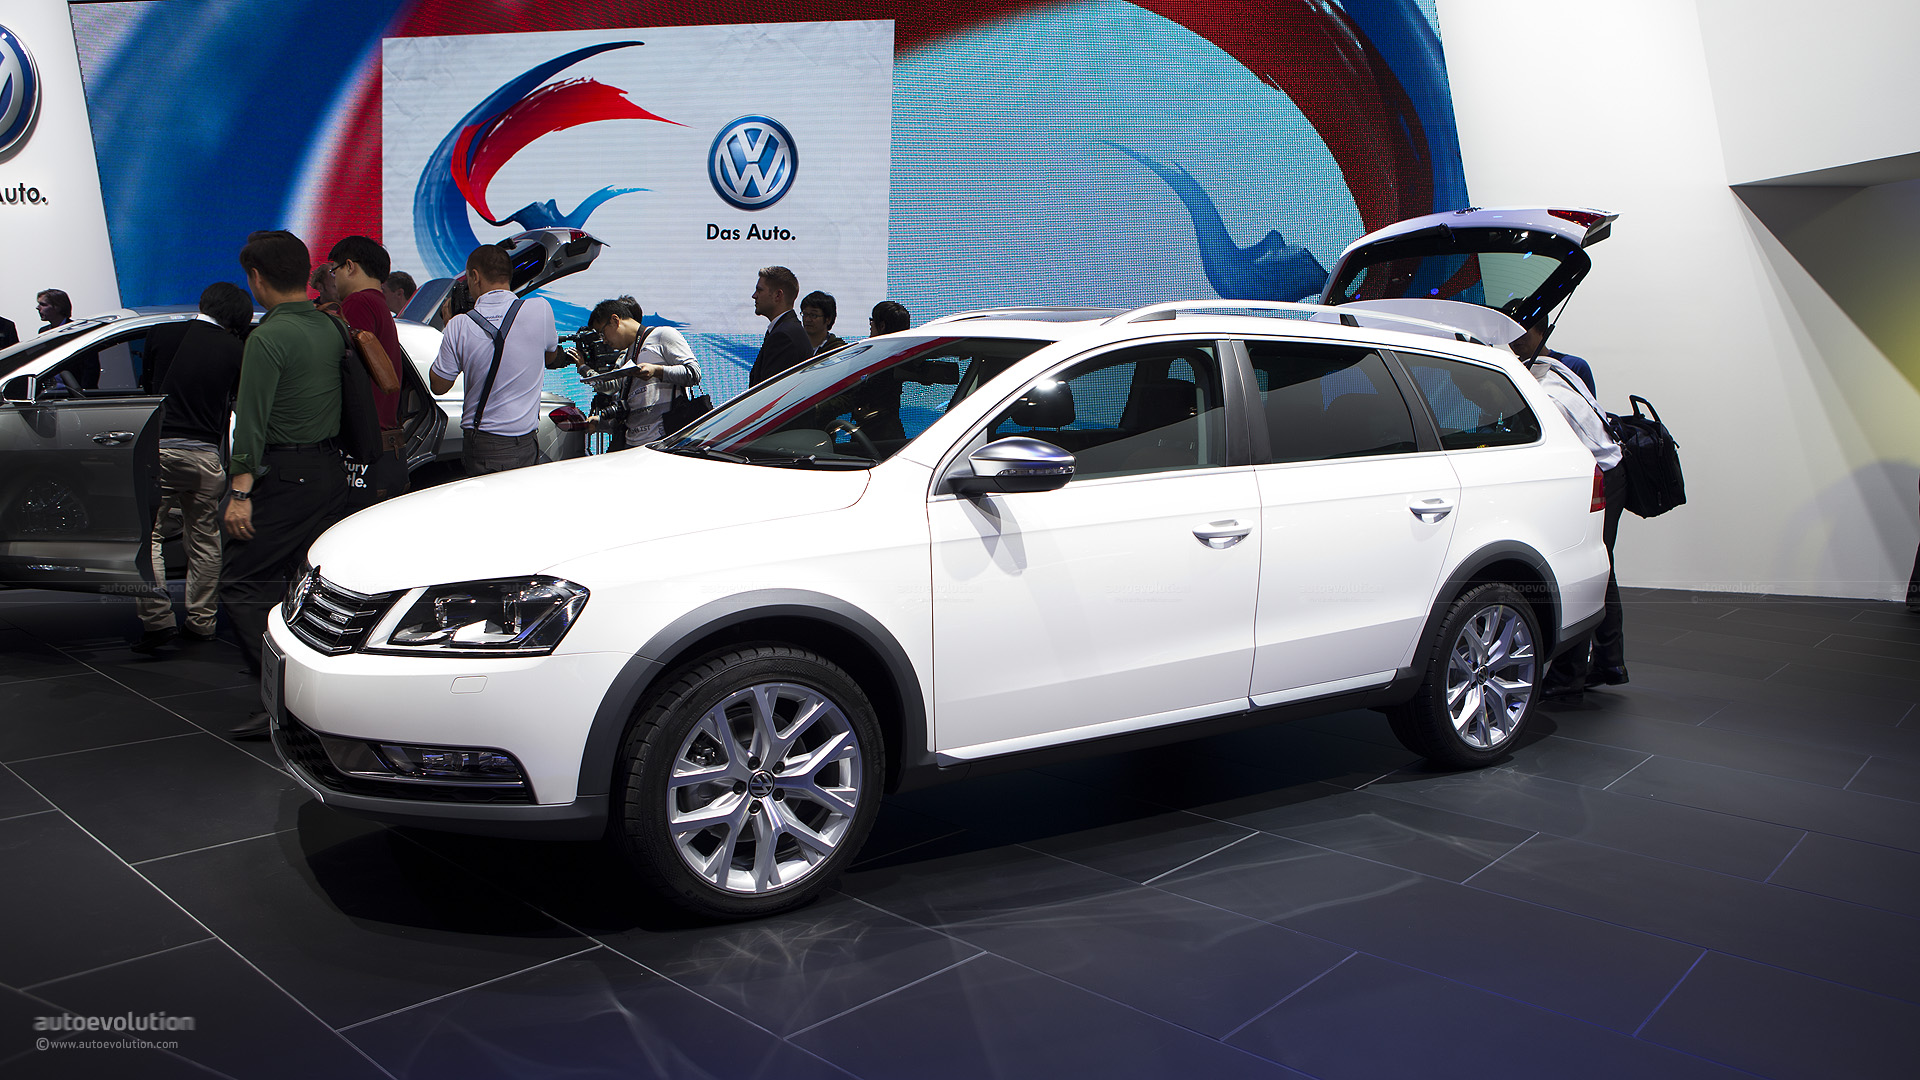 Volkswagen passat 2019 (b8) цены и комплектации! фото, характеристики, alltrack